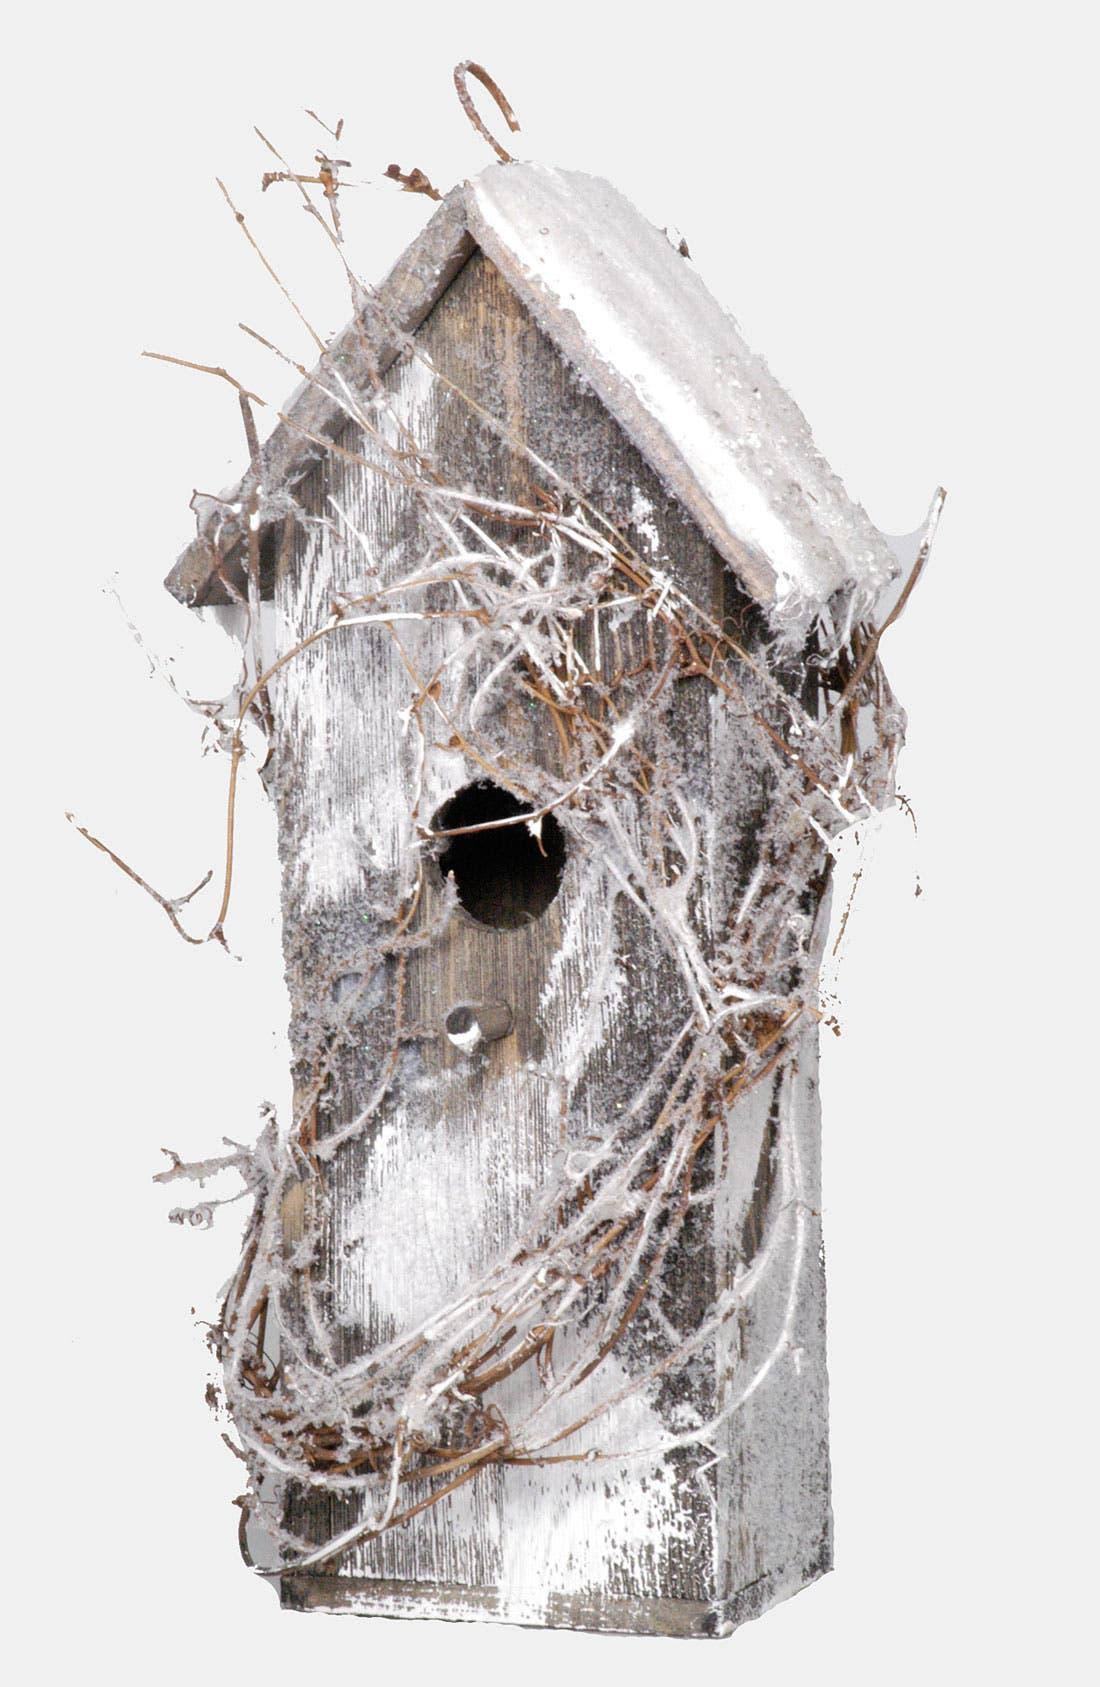 Alternate Image 1 Selected - Fantastic Craft 'Snow Birdhouse - Medium' Decoration